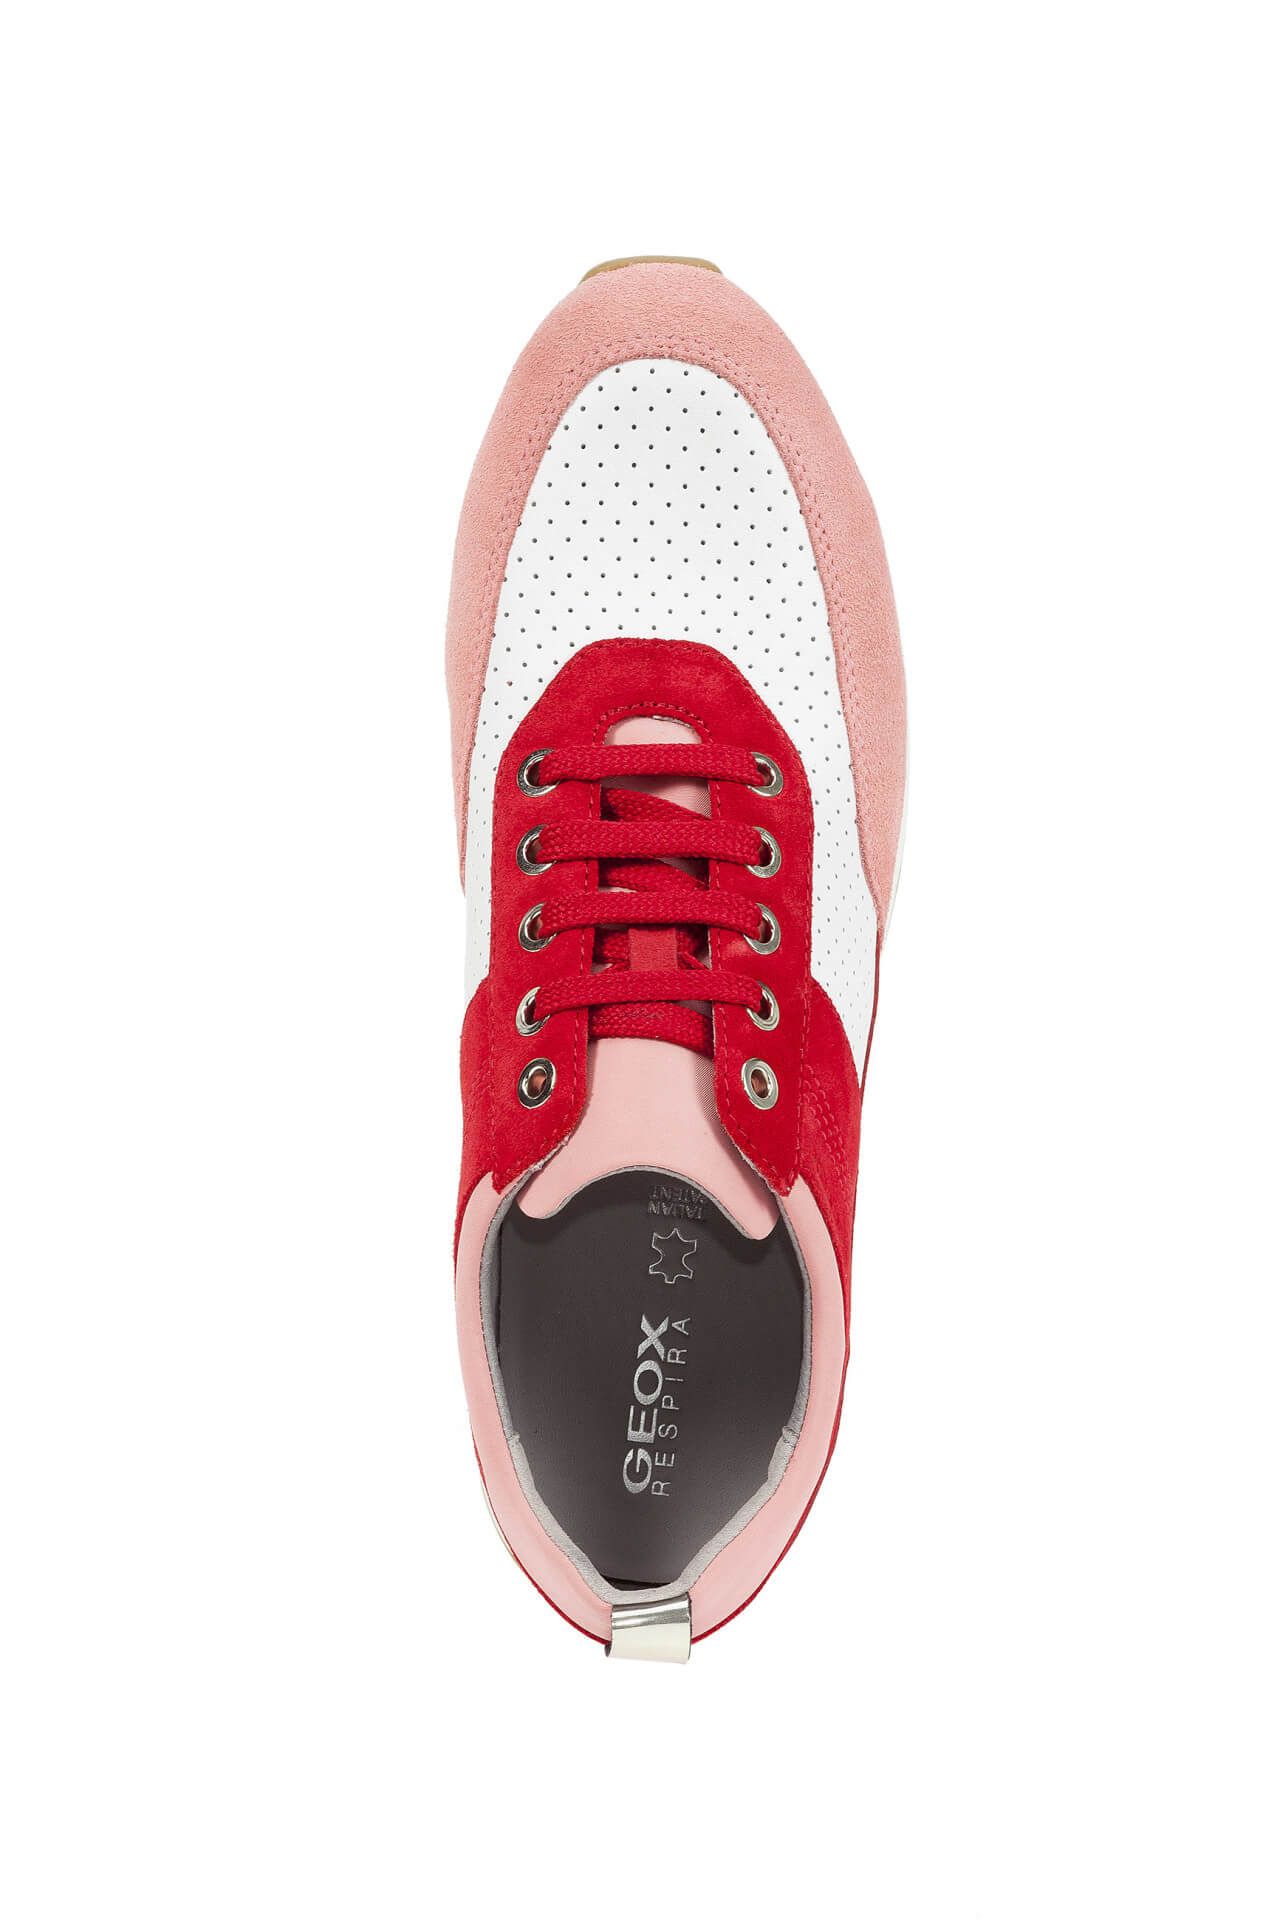 Geox Női sportcipő Tabelya B Red White D84AQB-02285-C0003 Új. Előző   Következő   a4099e715c